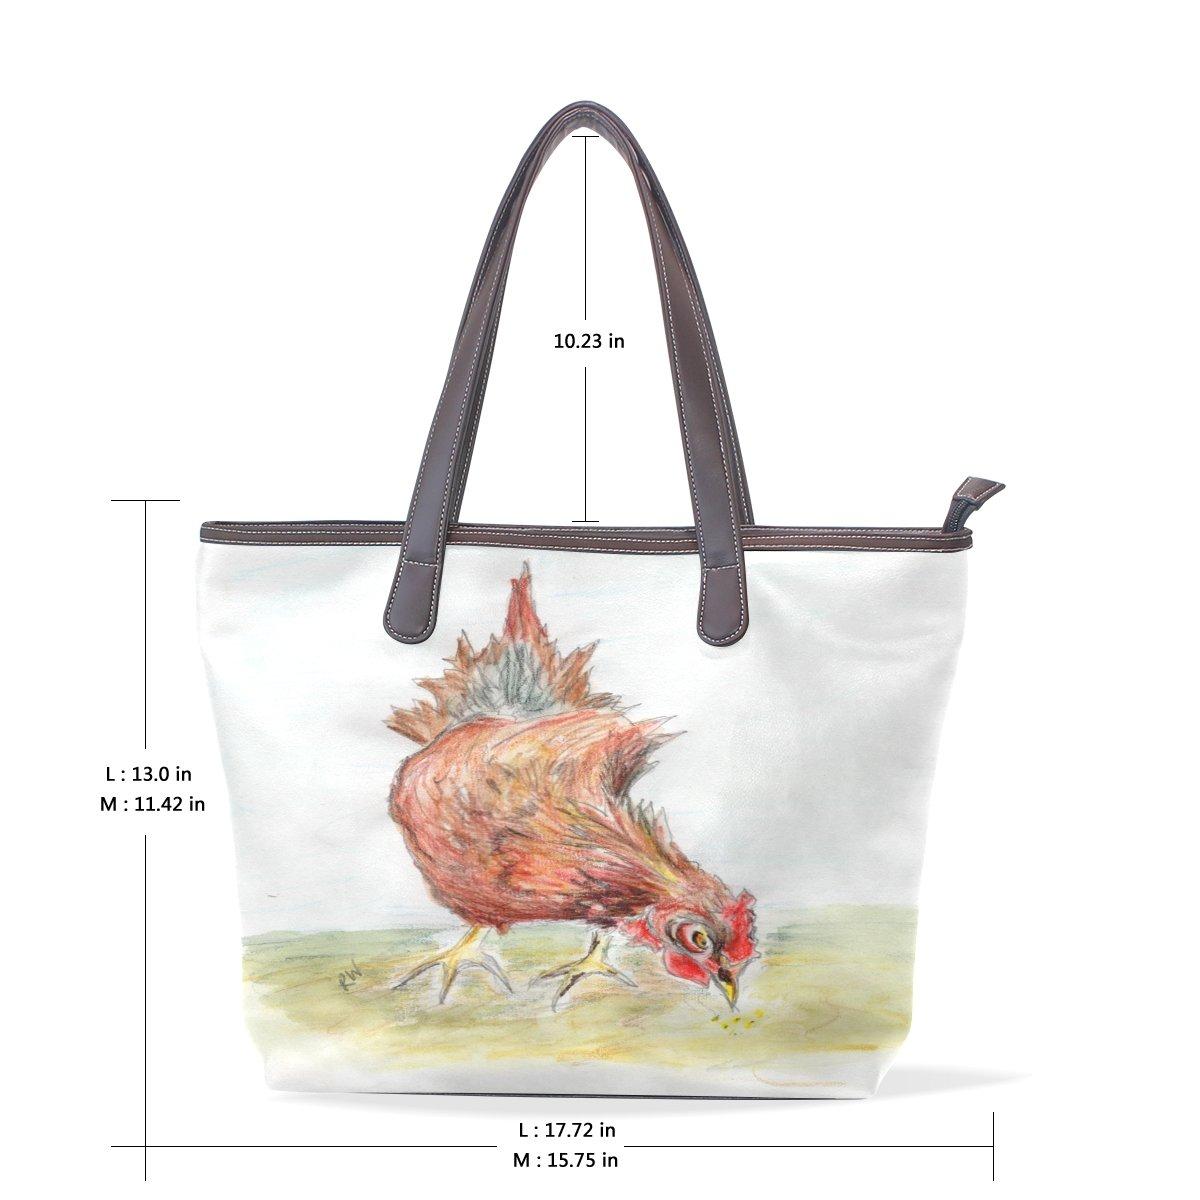 Mr.Weng Household Watercolor Chicken Lady Handbag Tote Bag Zipper Shoulder Bag